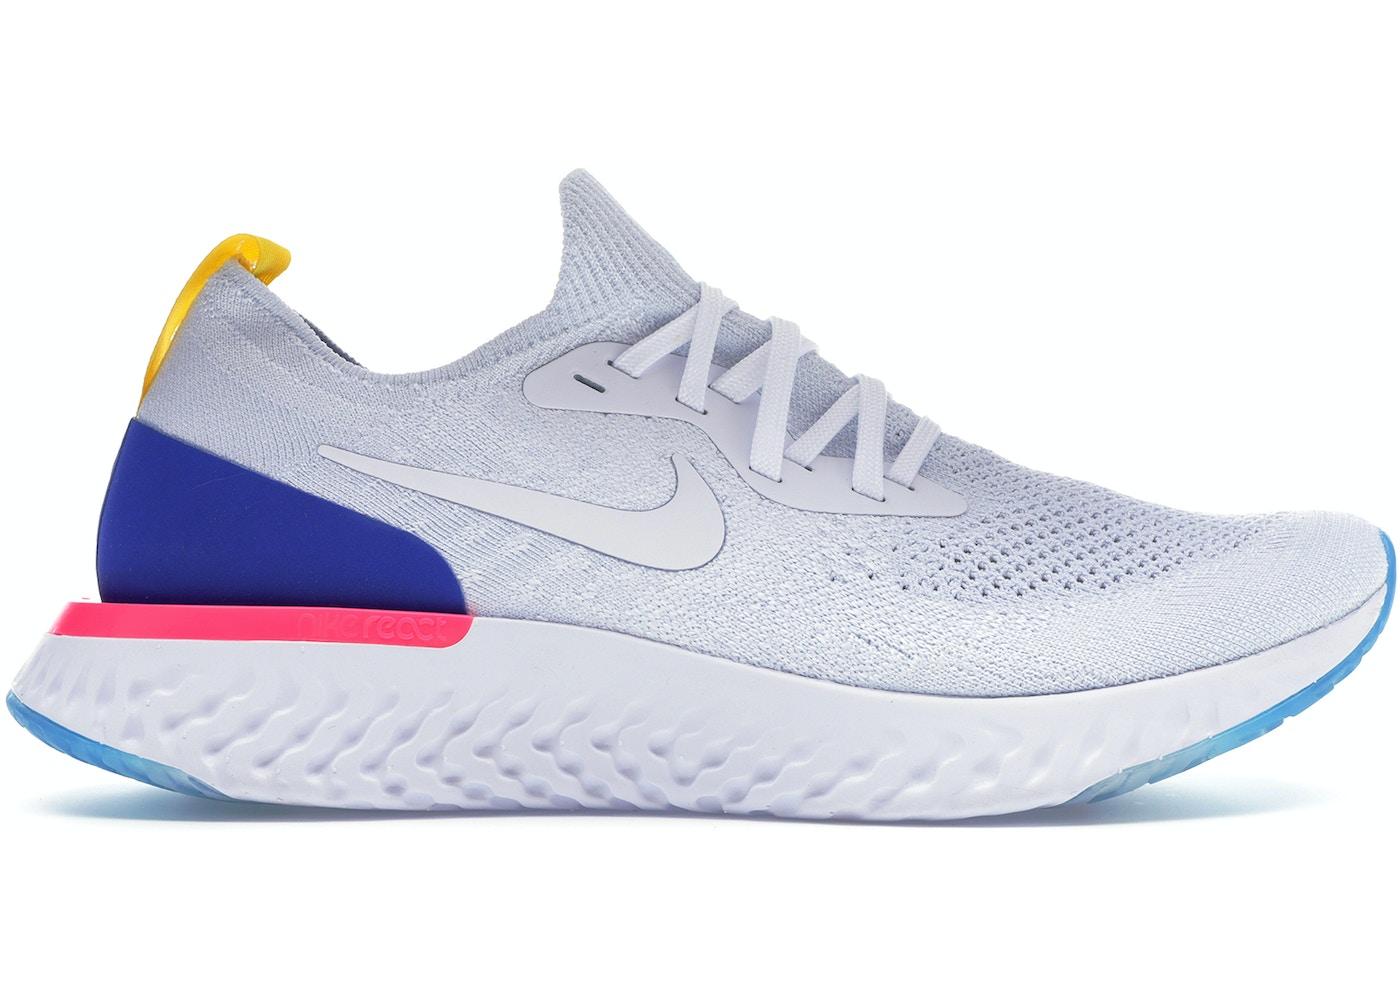 4e32d0ed2db9 Nike Epic React Flyknit White Racer Blue Pink Blast - AQ0067-101